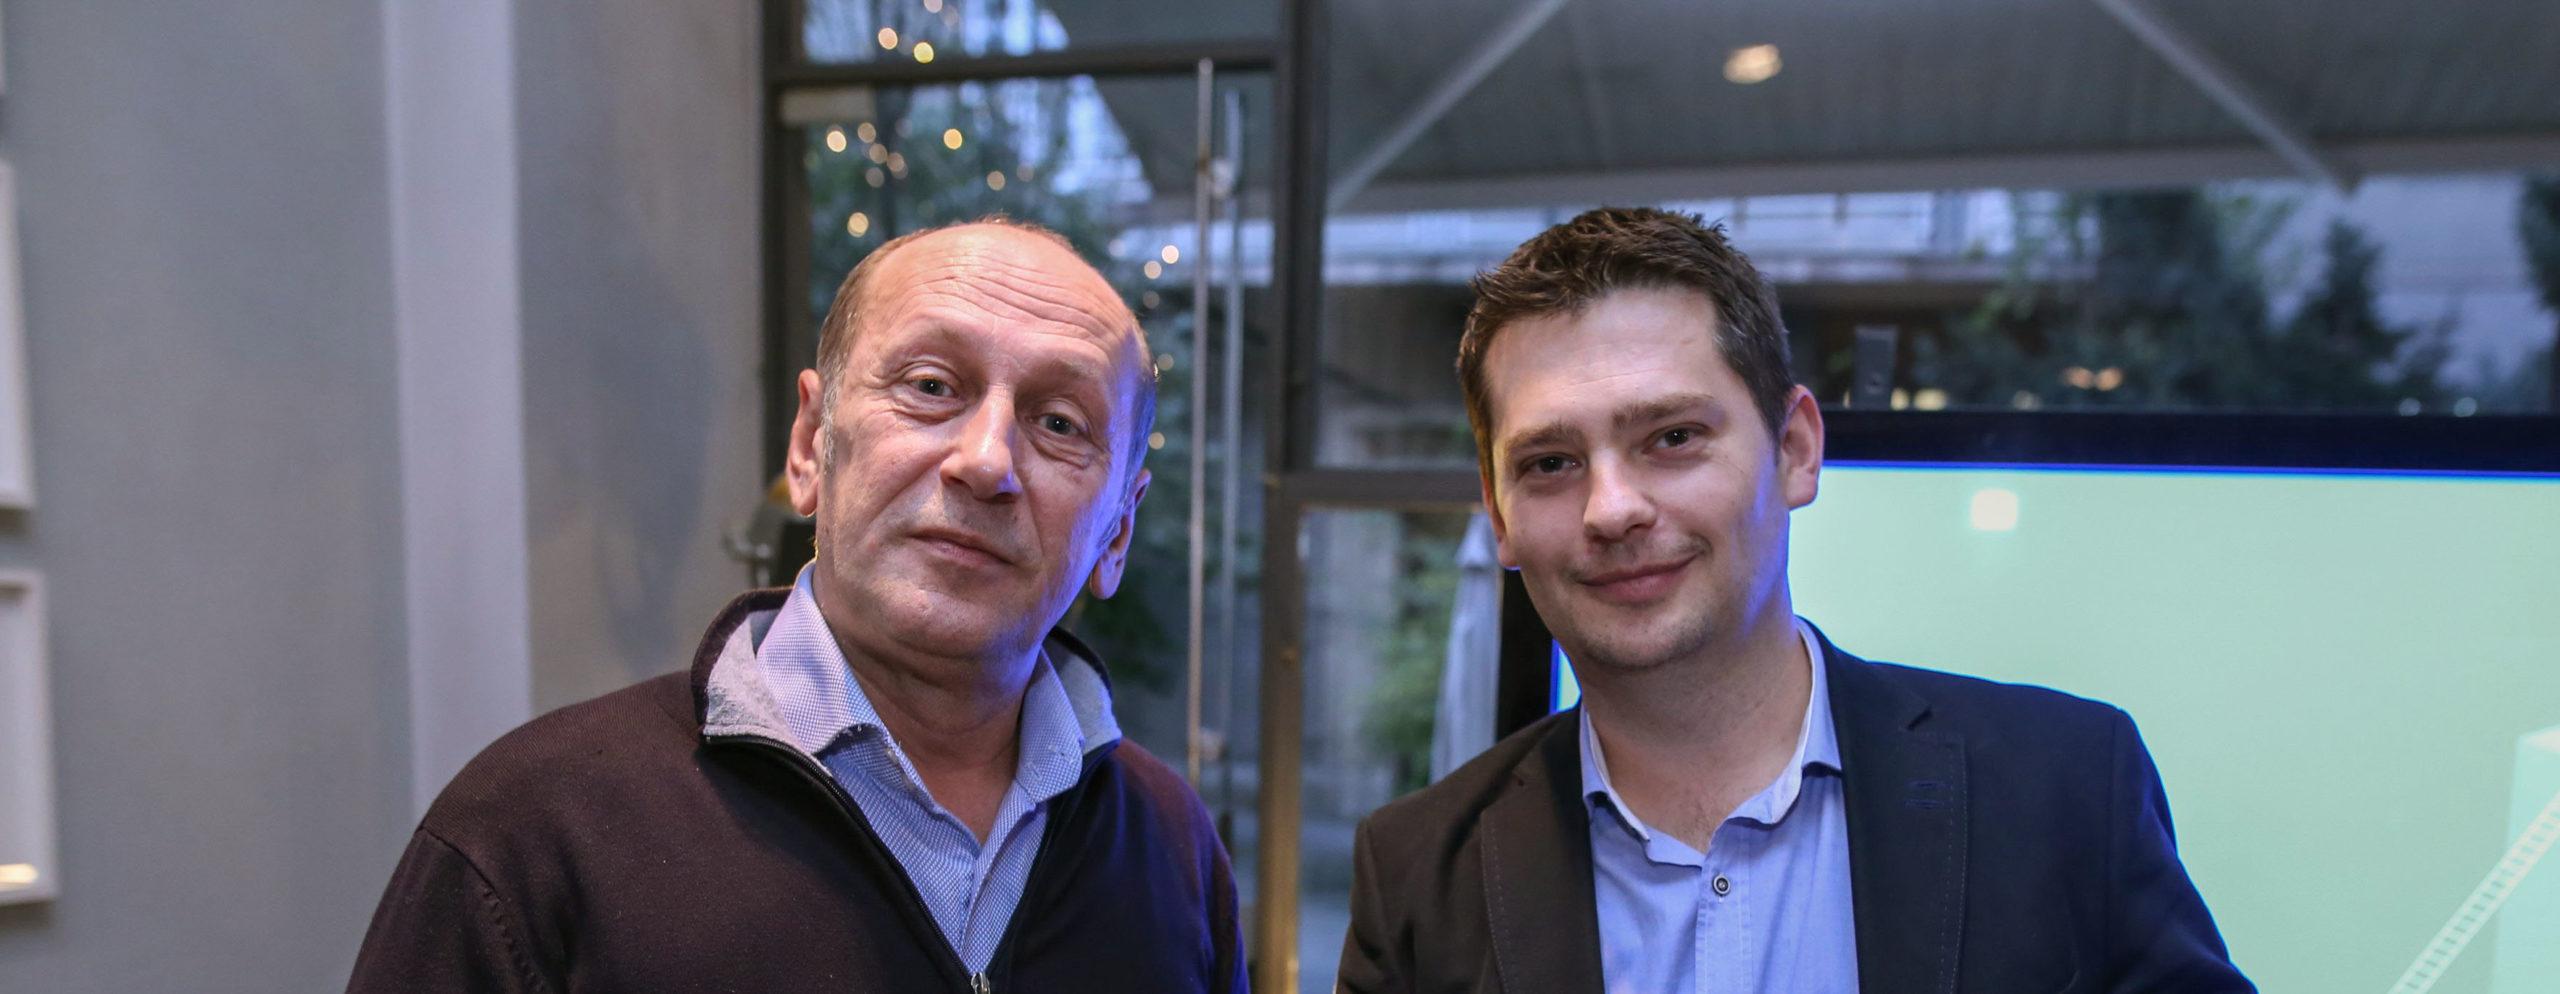 Epoha Portal Kamilo Antolović i Mario Fraculj